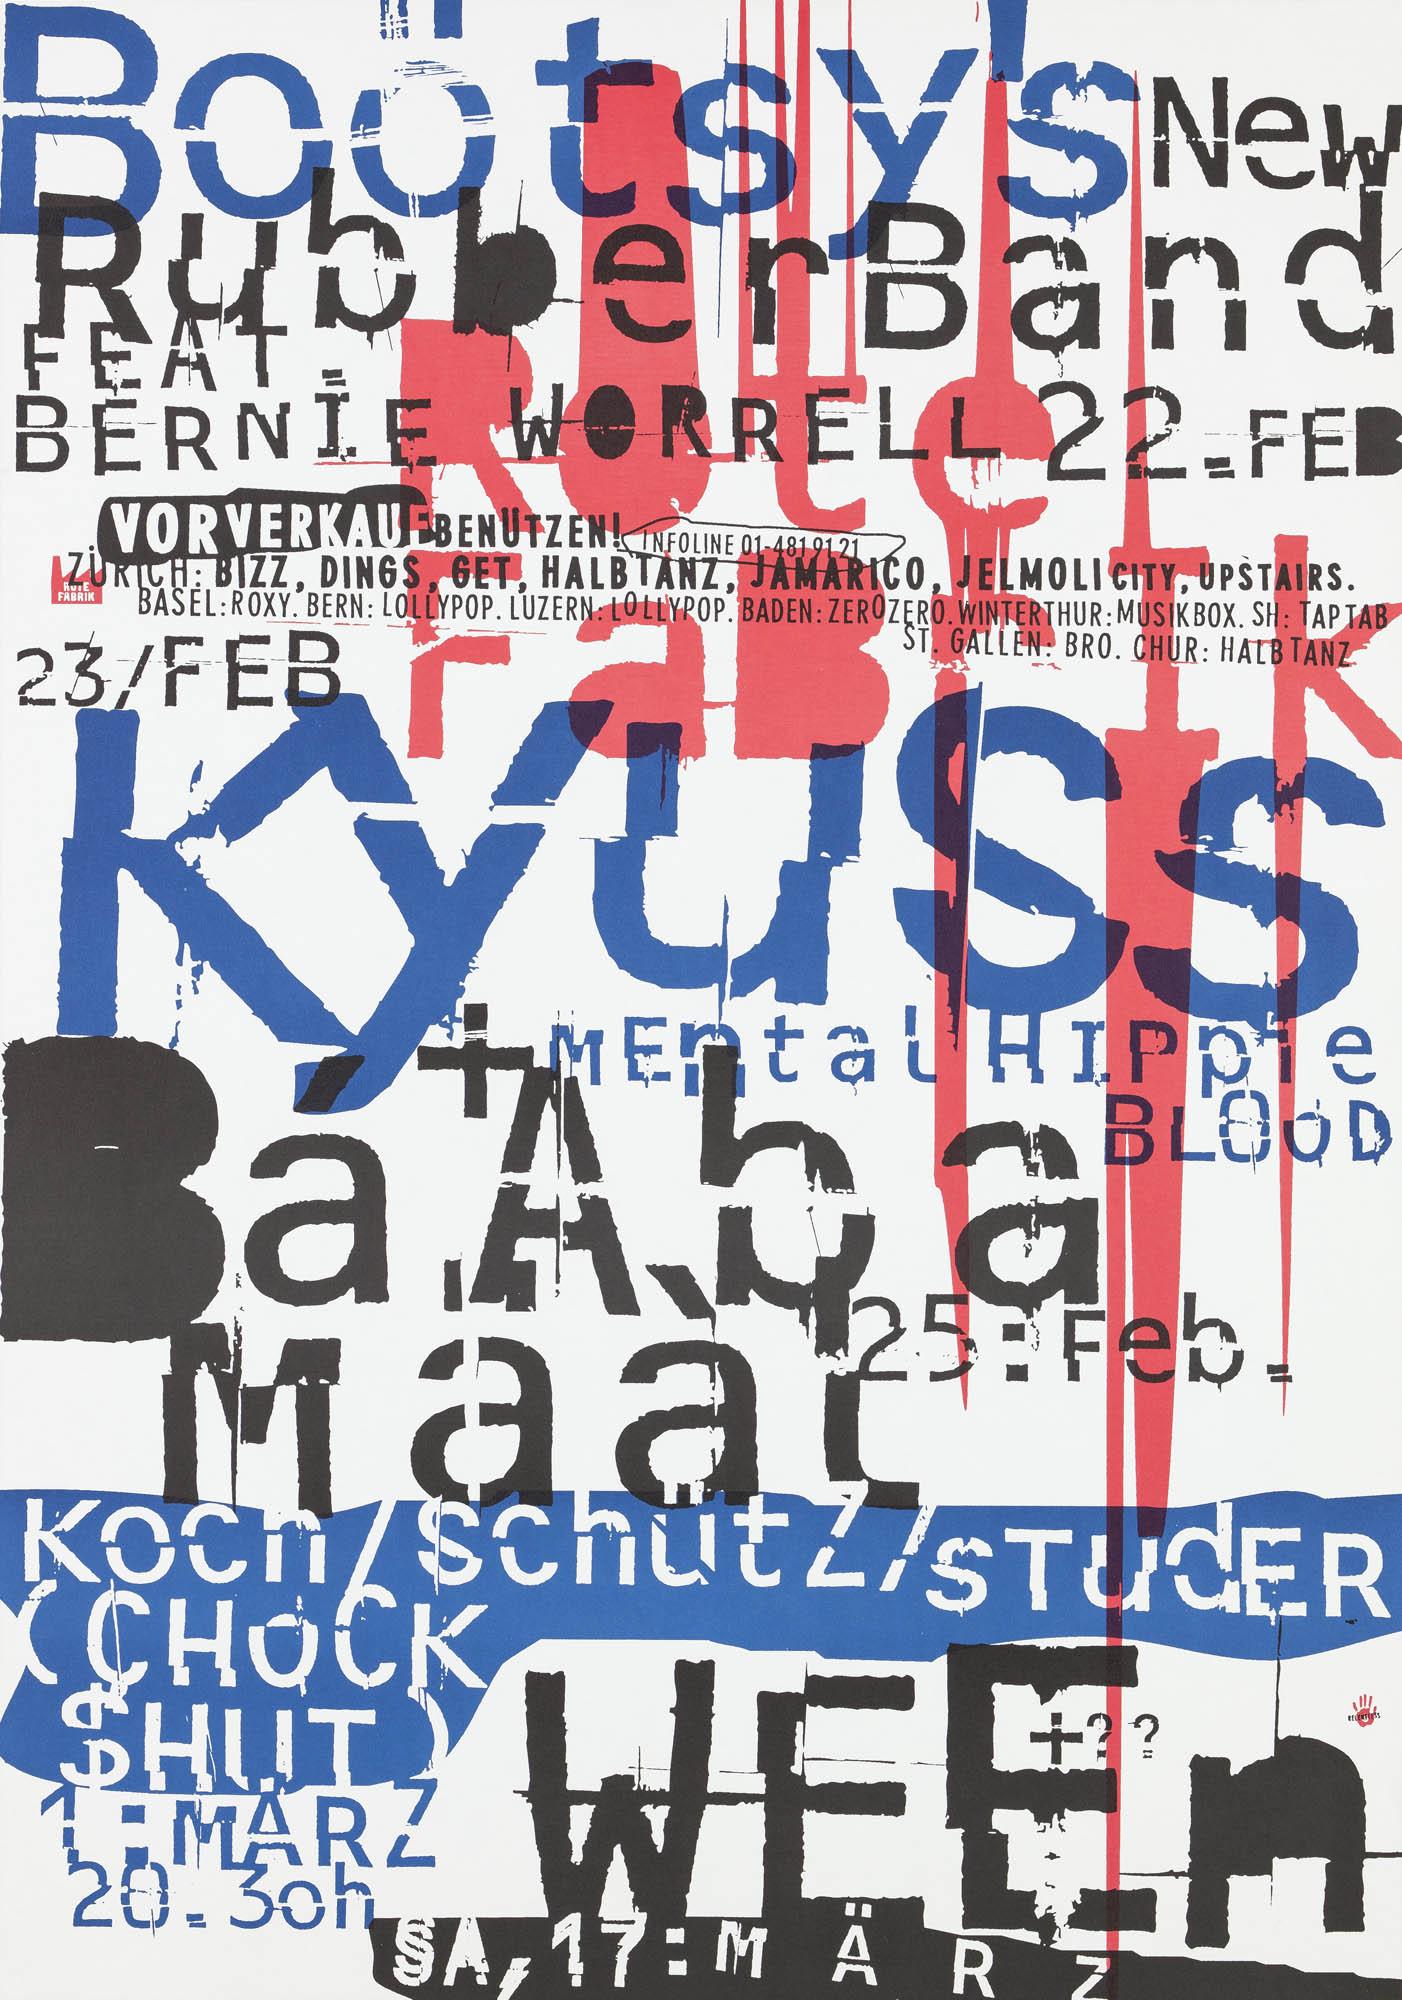 Mai 1994 – Rote Fabrik Cornel Windlin Affiche